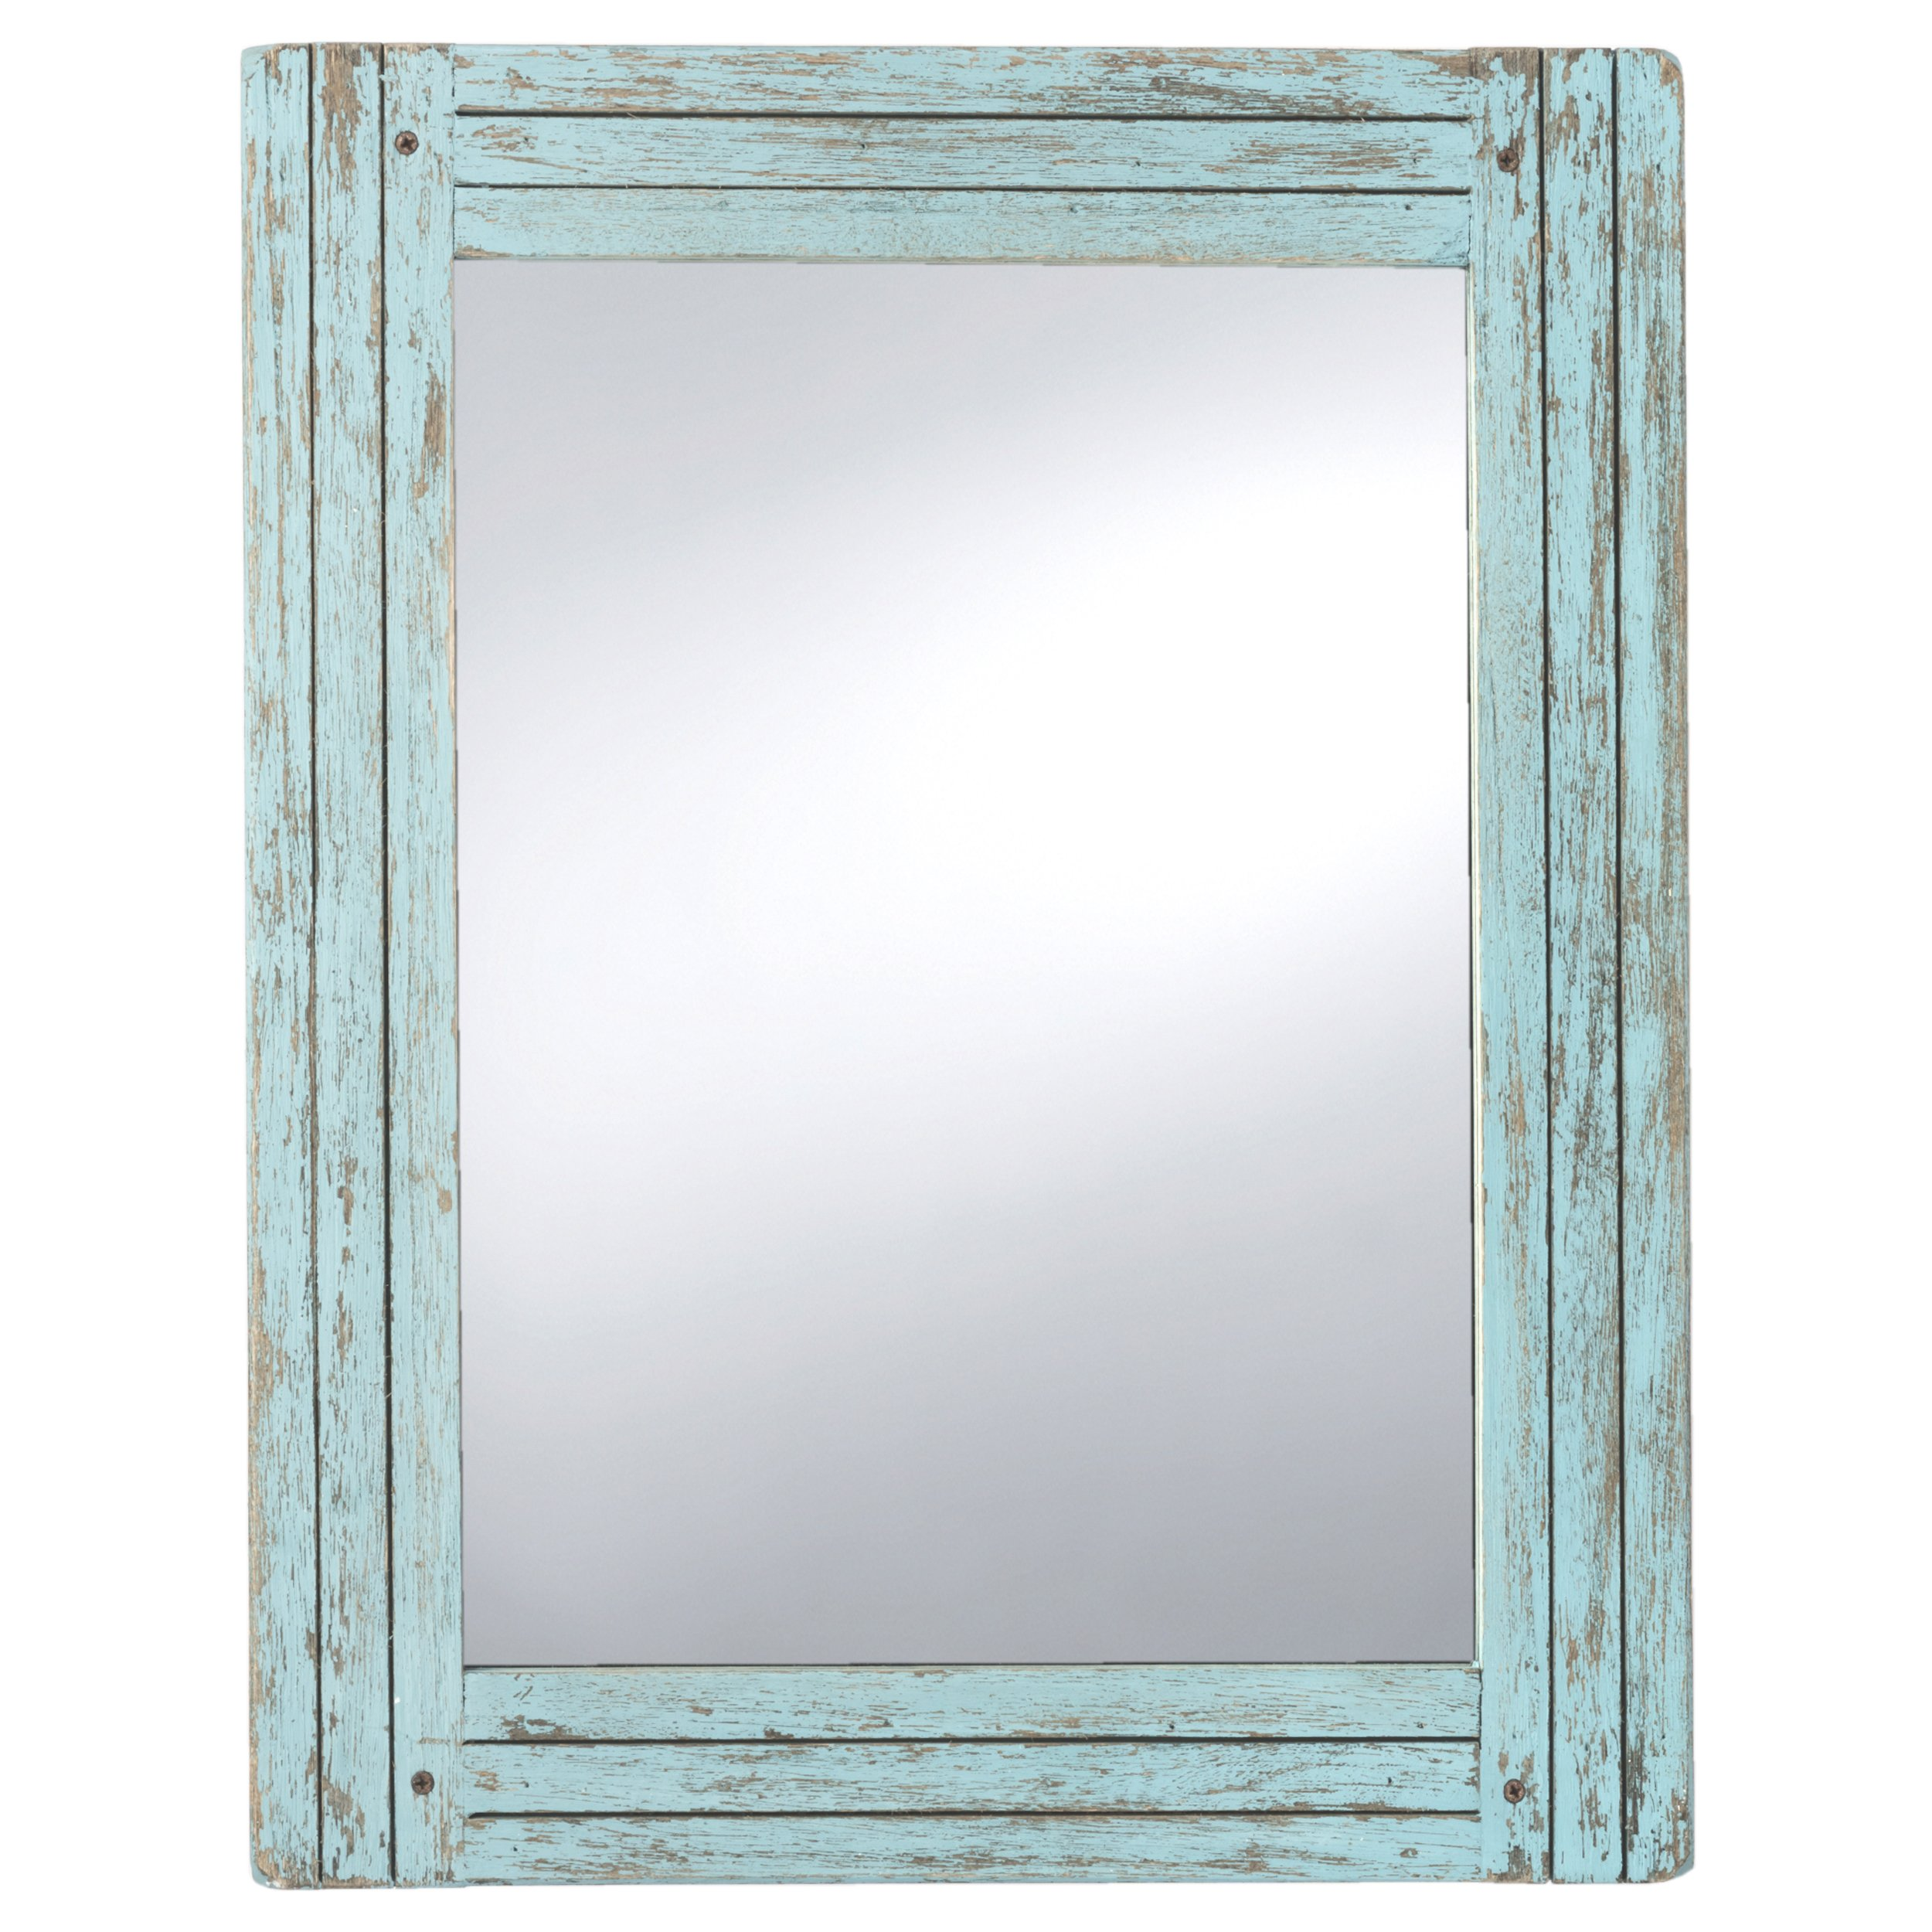 Prinz 18.5'' x 23.5'' Blue Water's Edge Homestead Mirror Distressed Wood by PRINZ (Image #1)